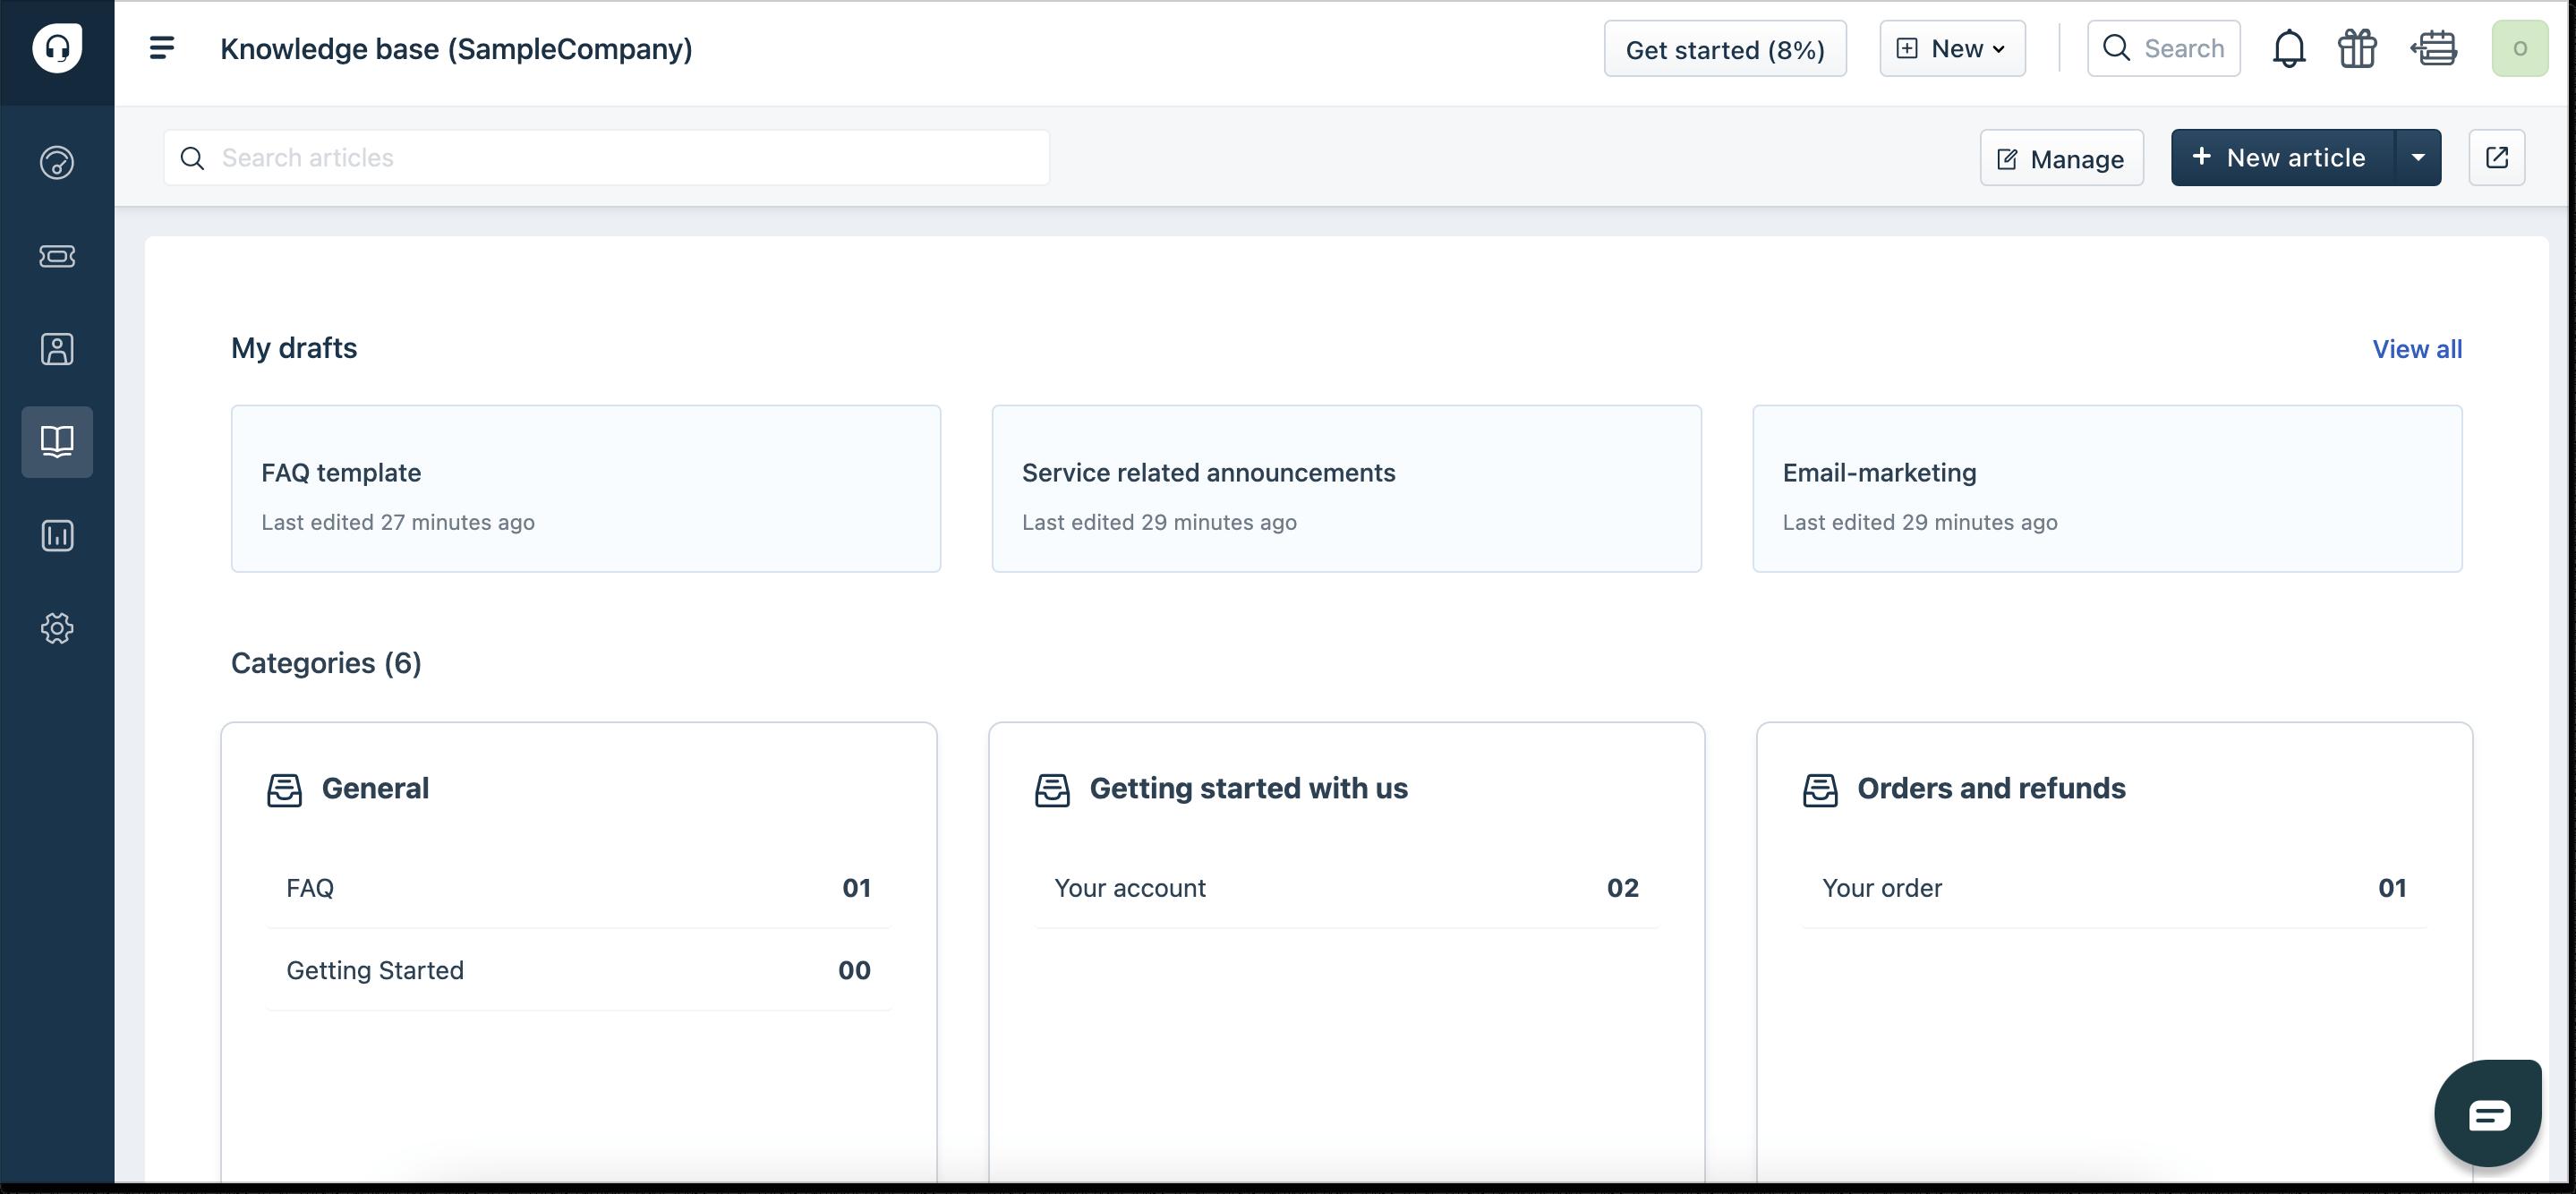 freshdesk self-service knowledge base